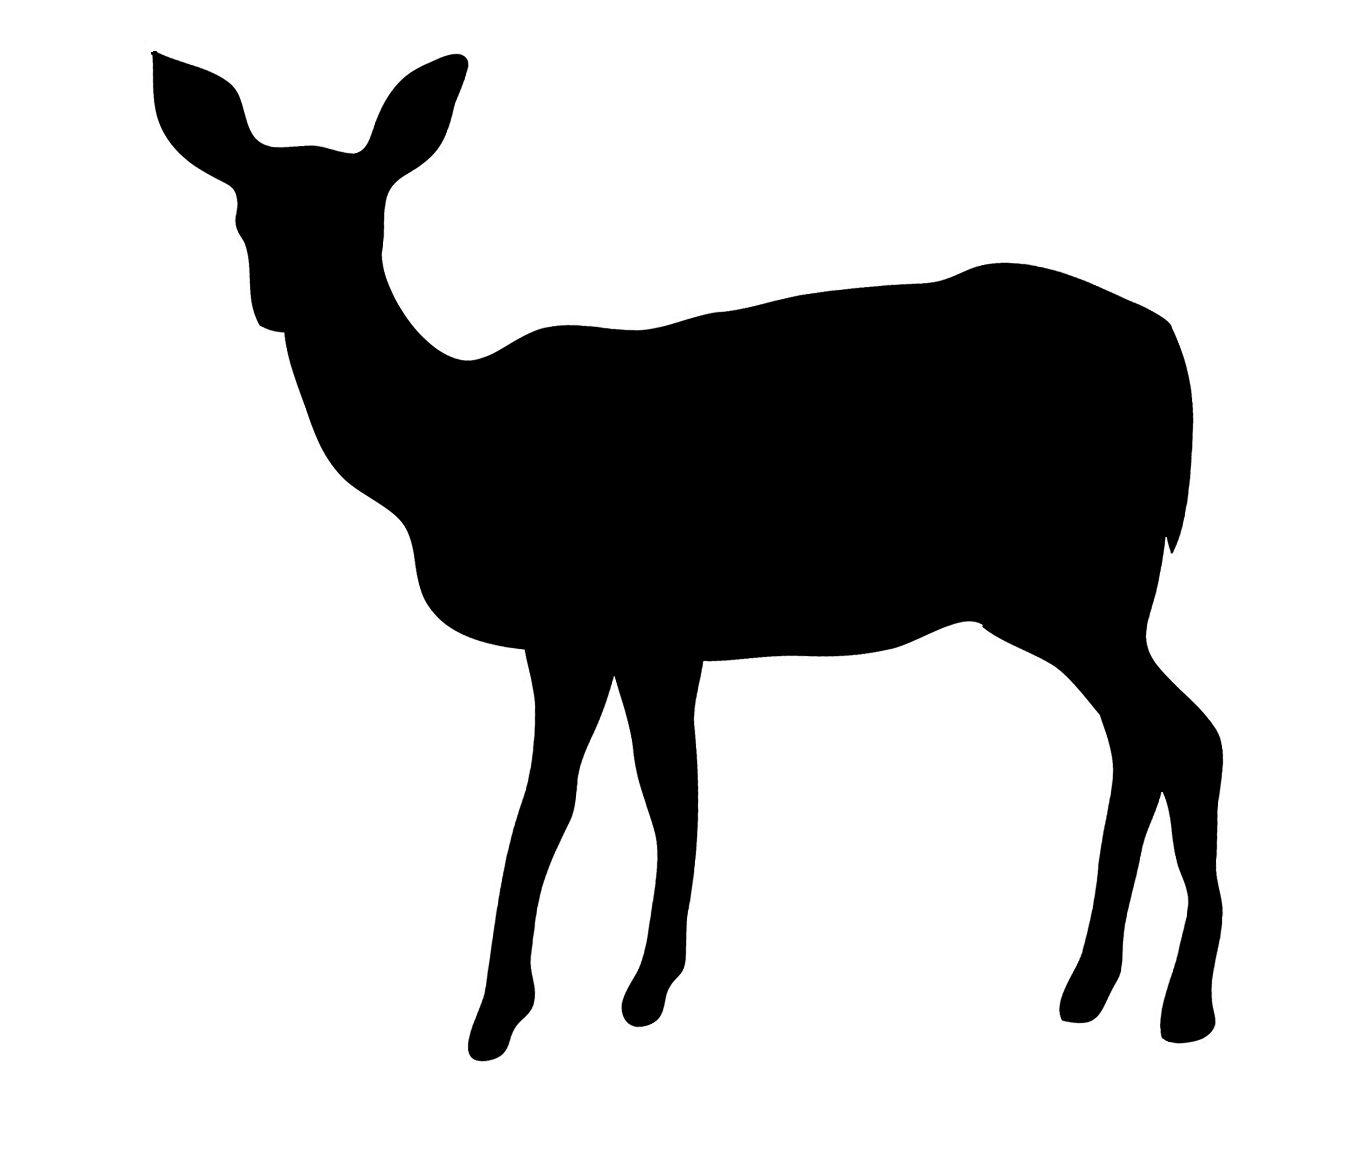 wildlife silhouette clip art at getdrawings com free for personal rh getdrawings com